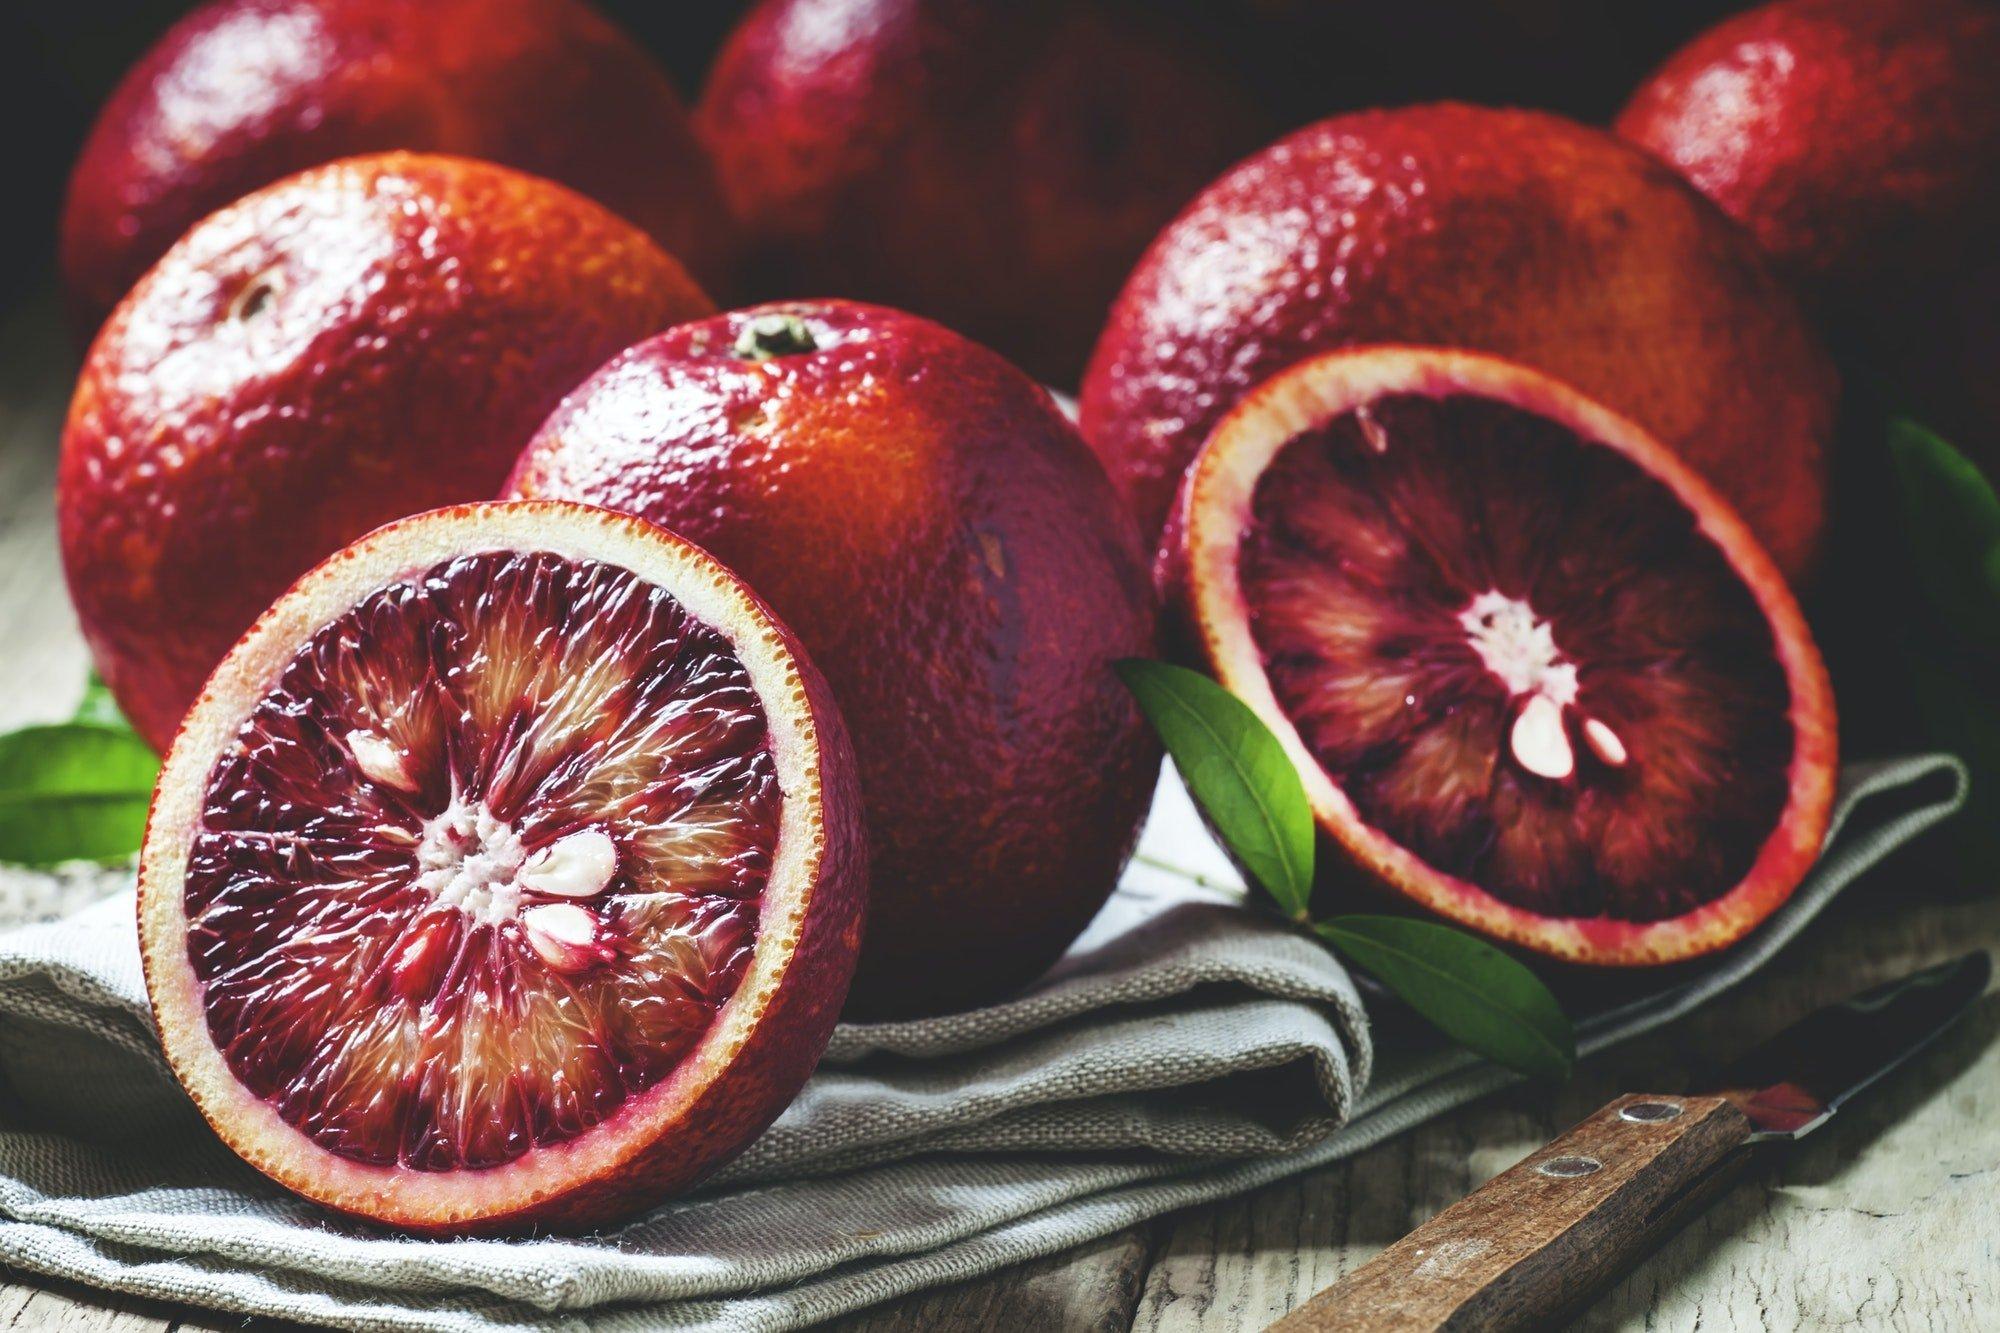 Halved red Sicilian oranges